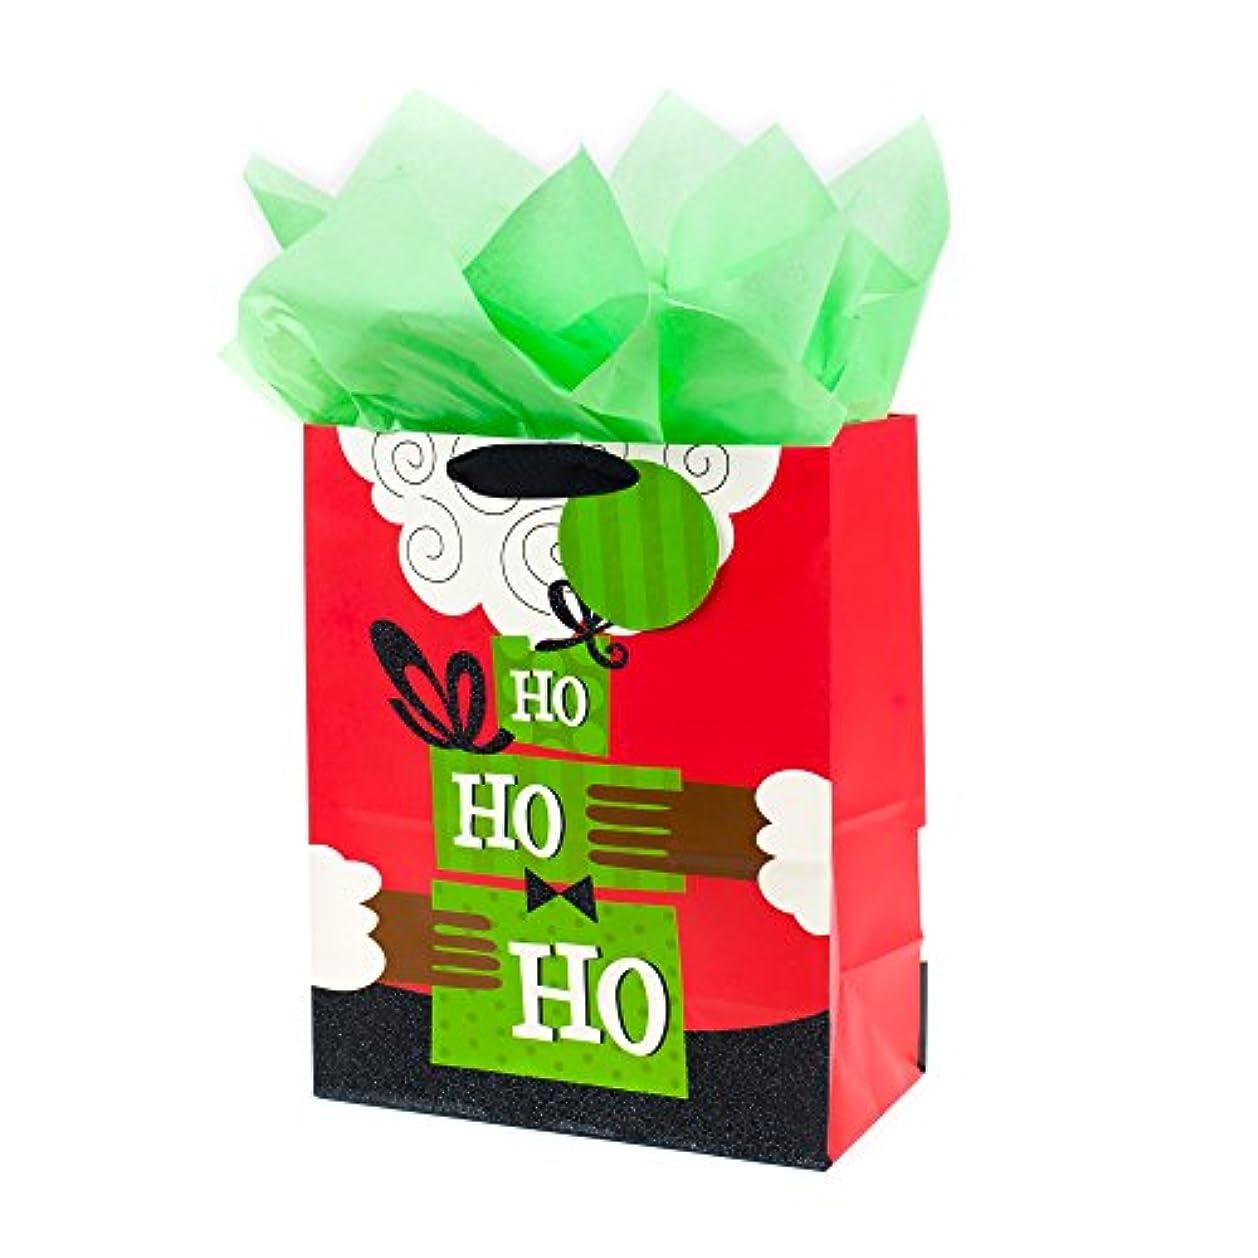 Hallmark Mahogany Large Christmas Gift Bag with Tissue Paper (Ho Ho Ho) ogsjr3592